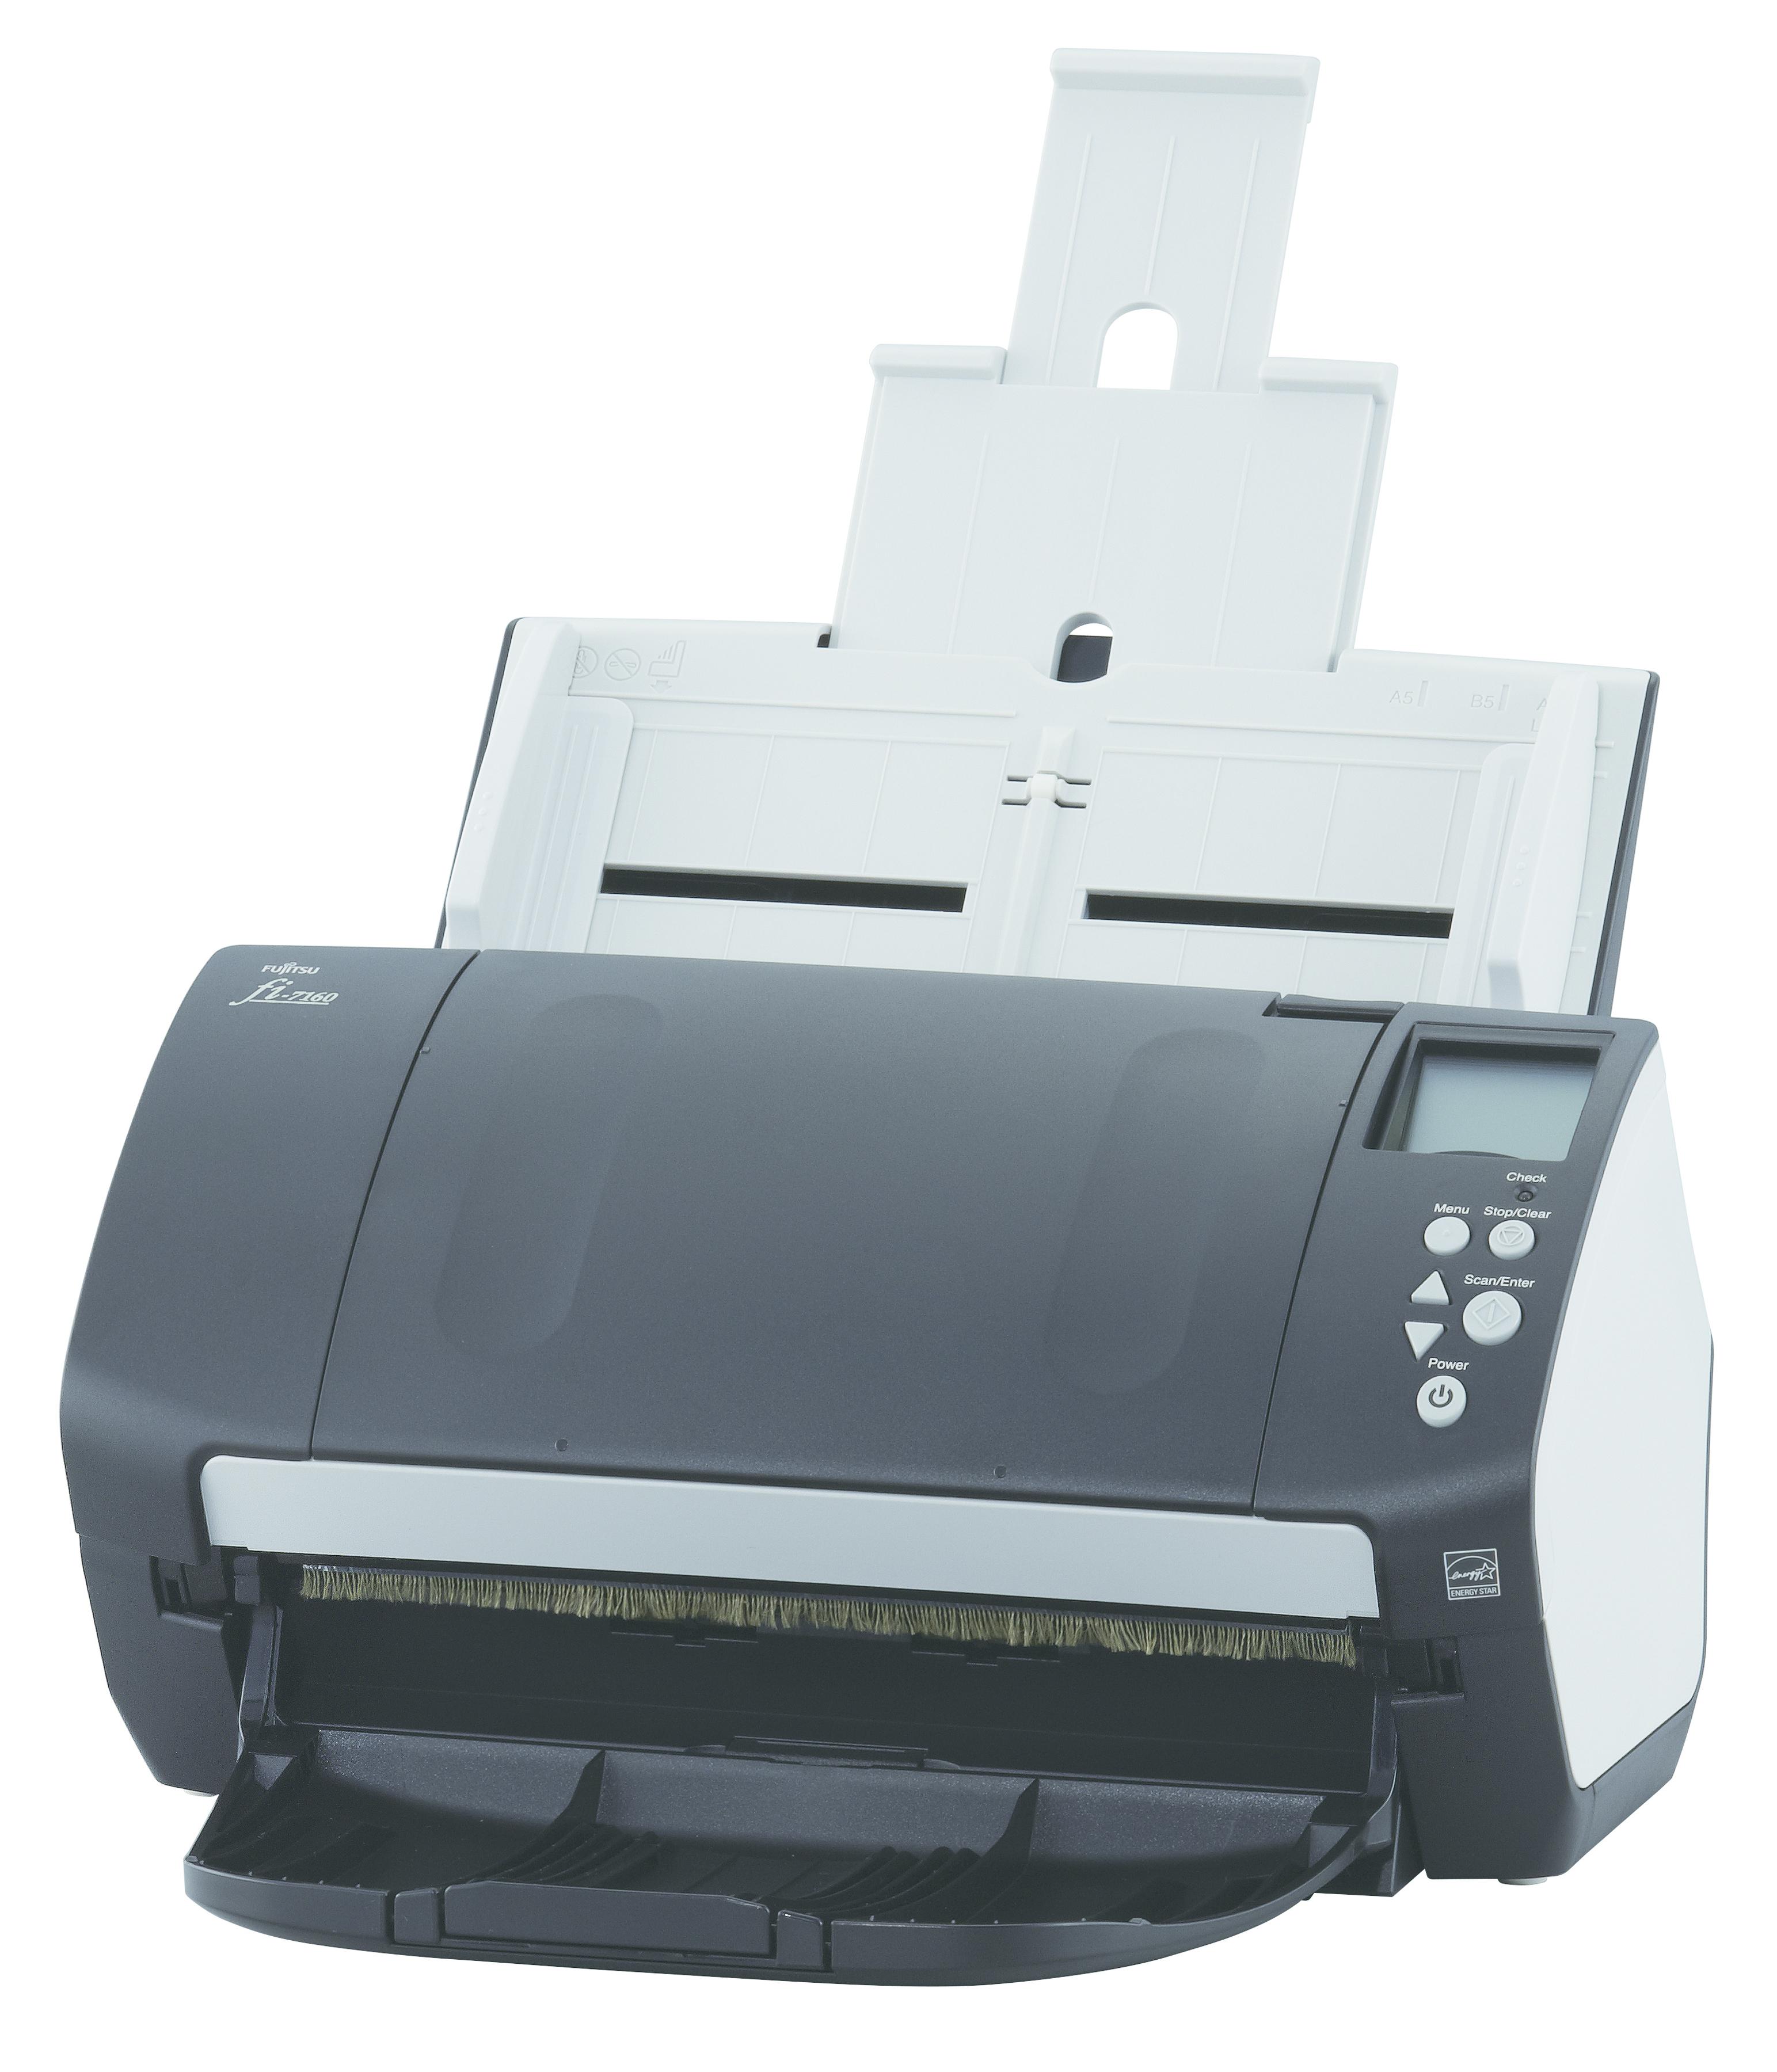 Fujitsu fi-7180 - Dokumentenscanner - 600x600 dpi - A4 USB, USB 3.0